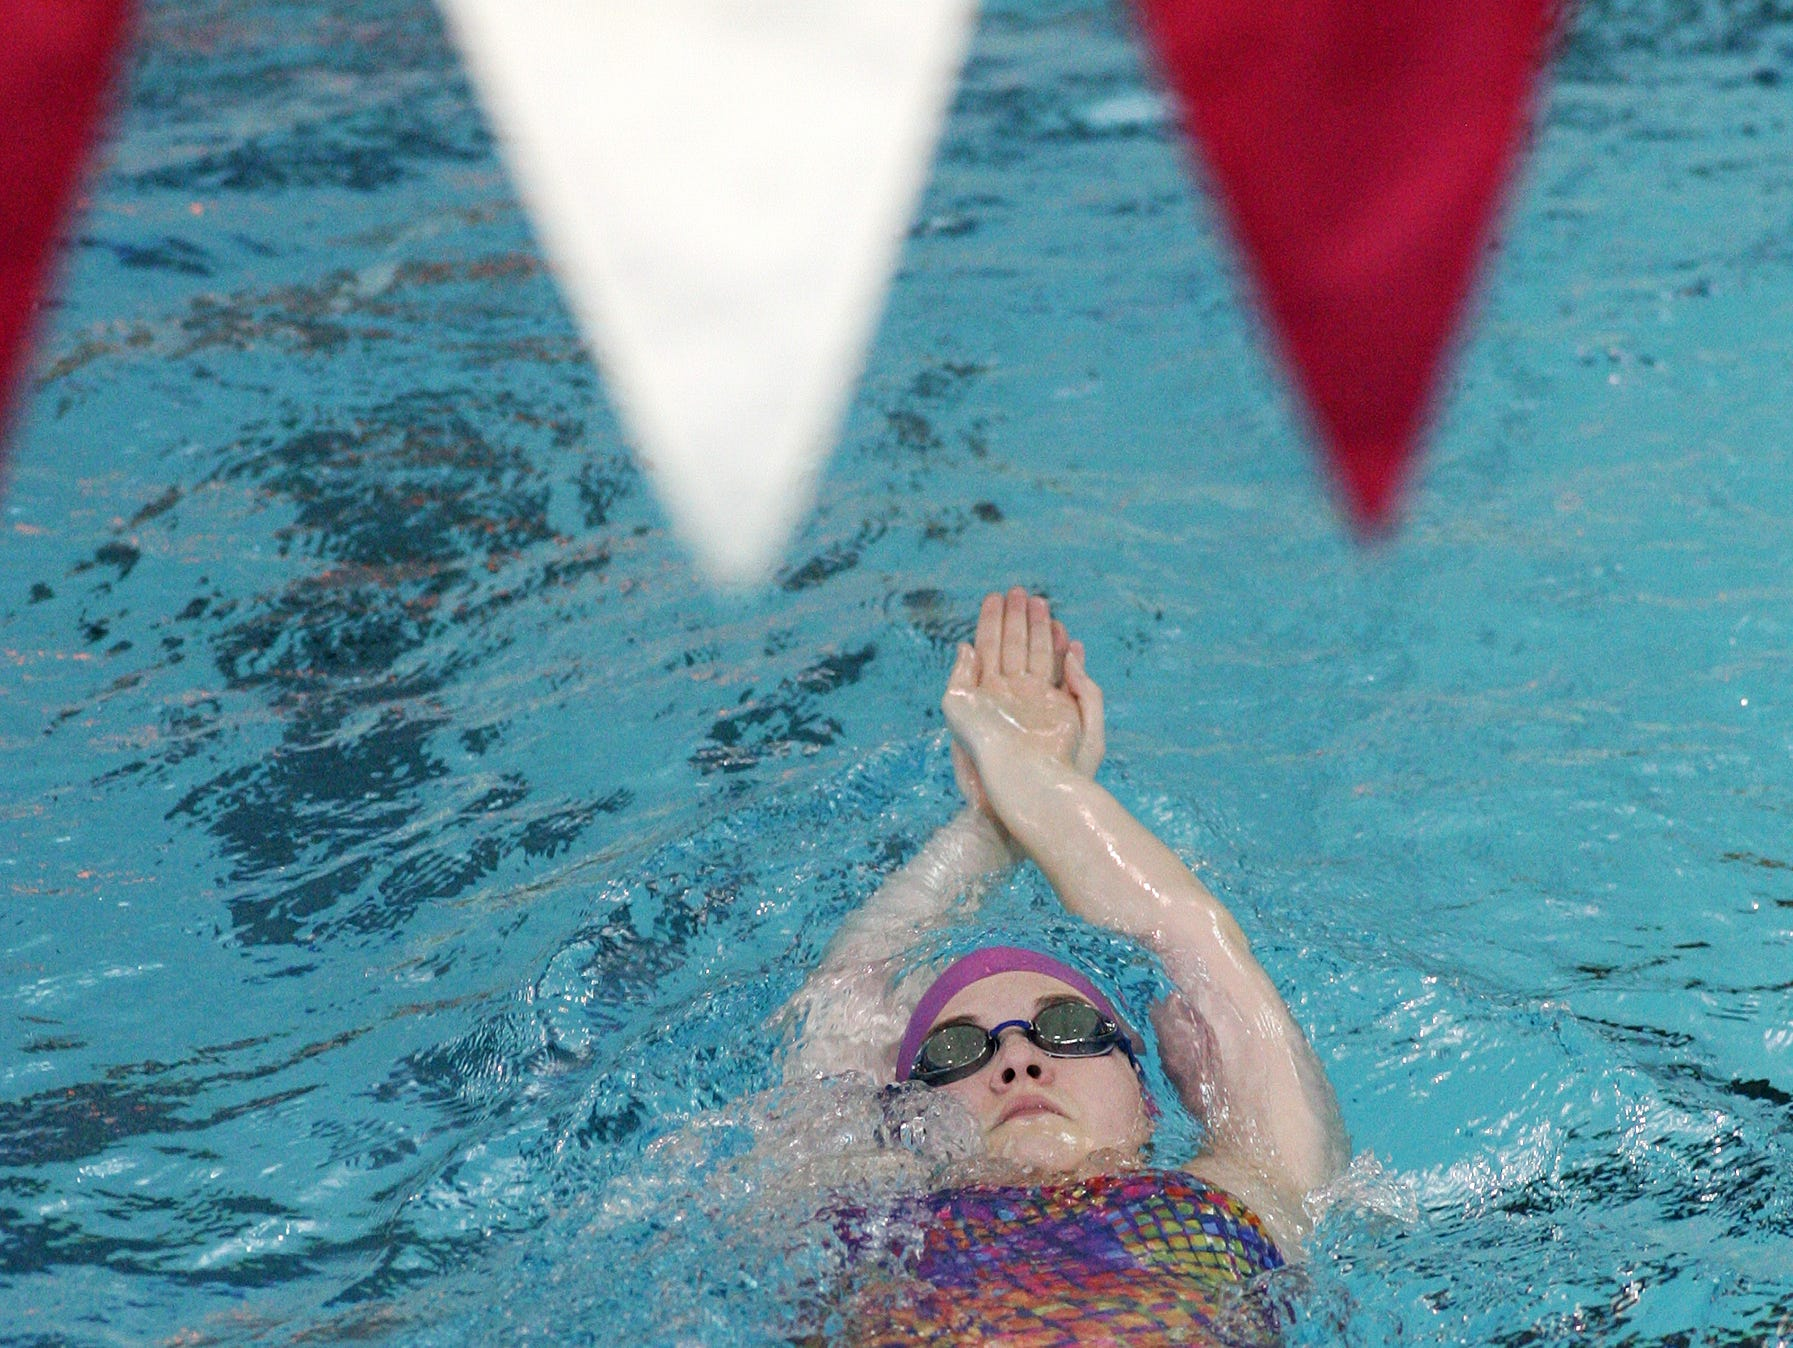 Lauren Cummons, 15, a freshman at Utica High School, practices with the Pau Hana swim club Tuesday at Denison.